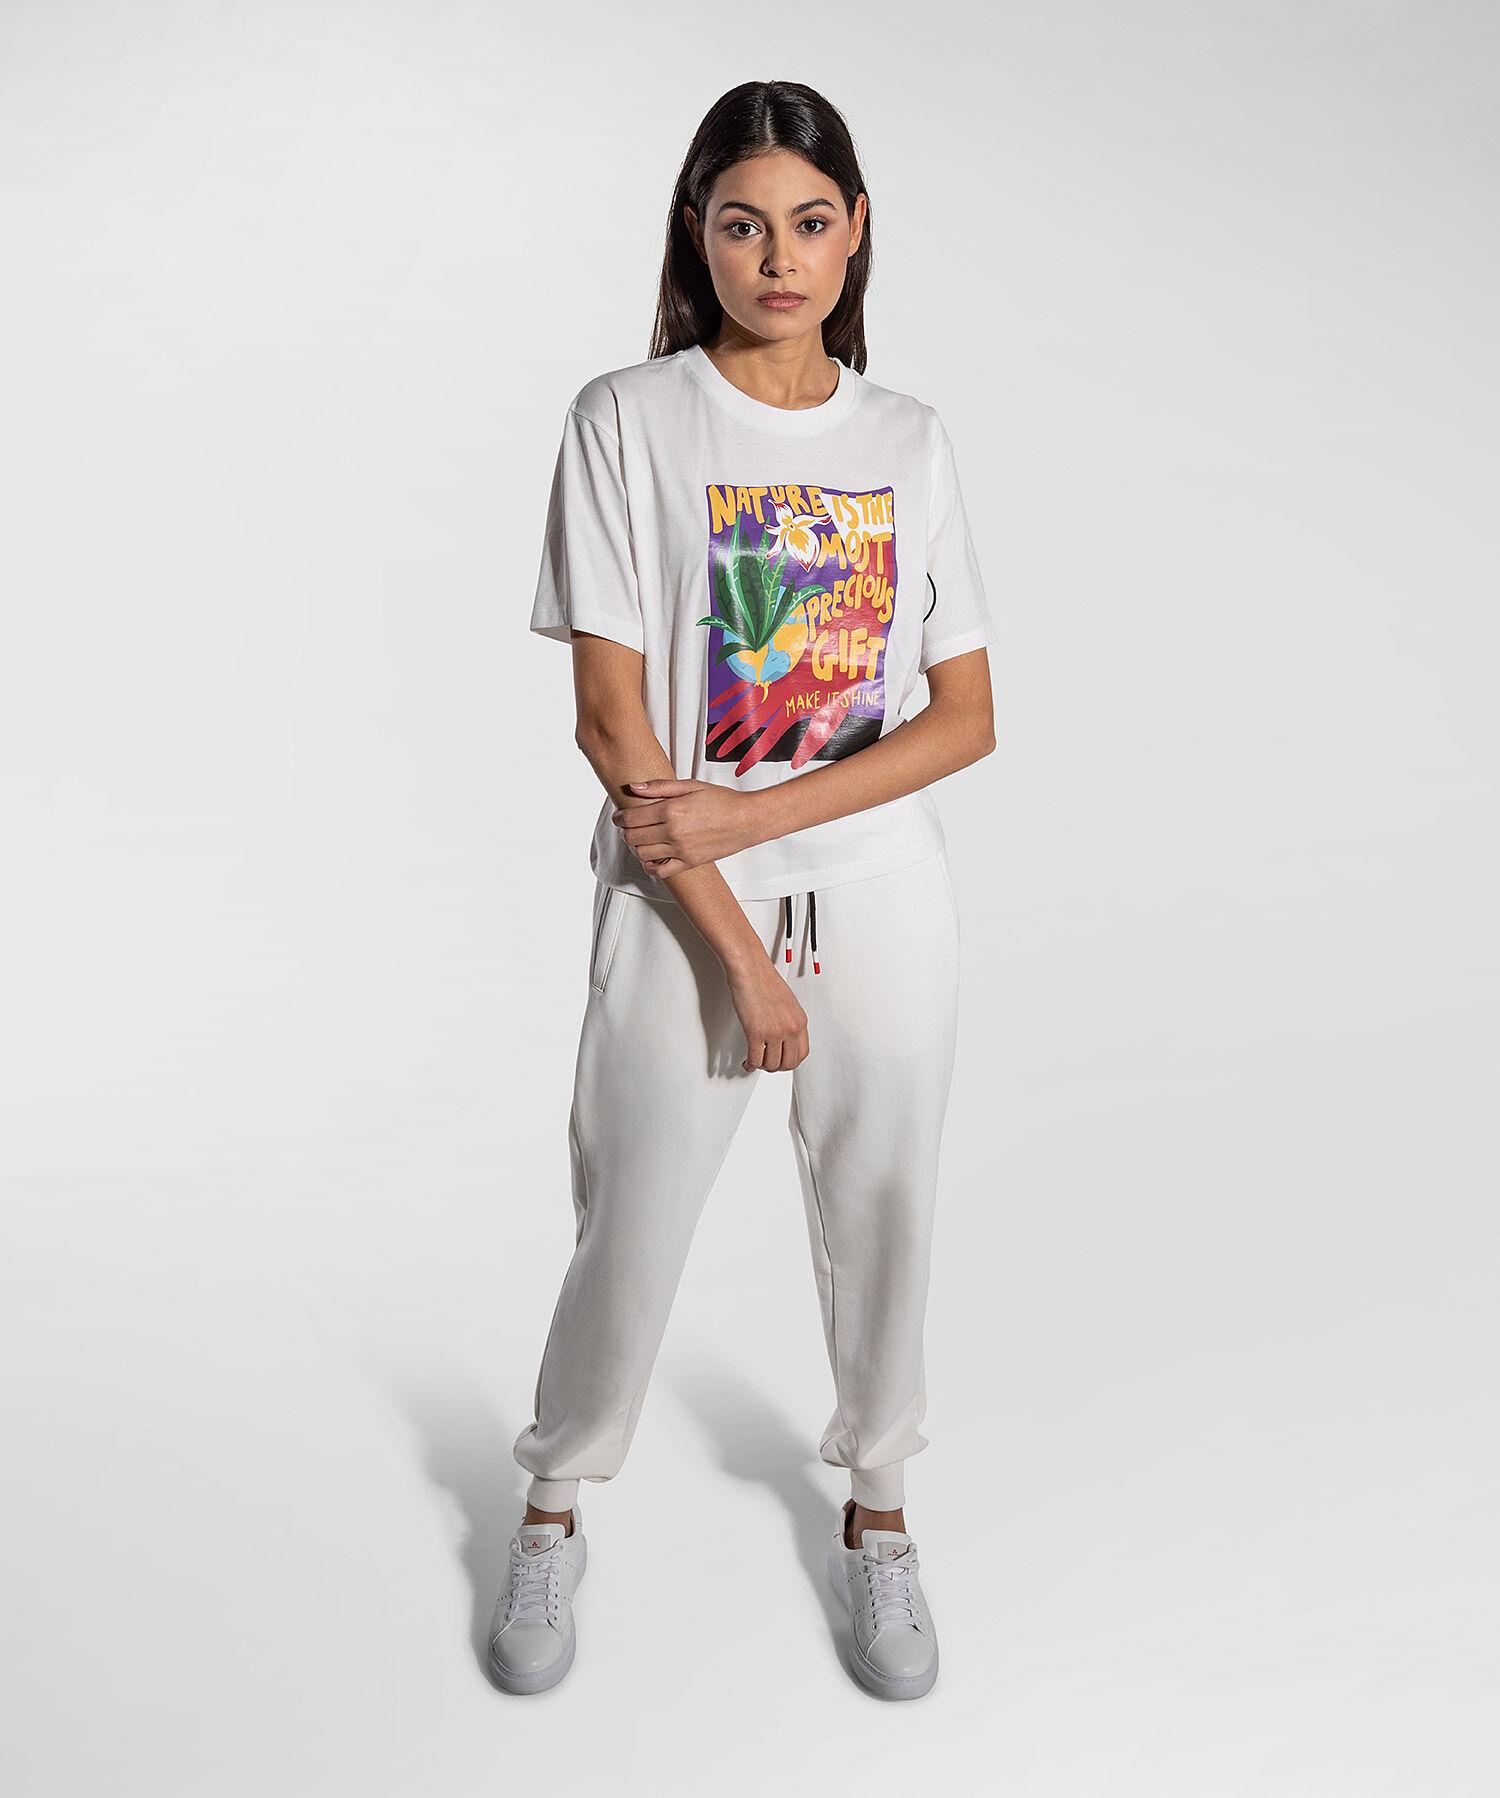 T-Shirt Con Claim Nature - Peuterey